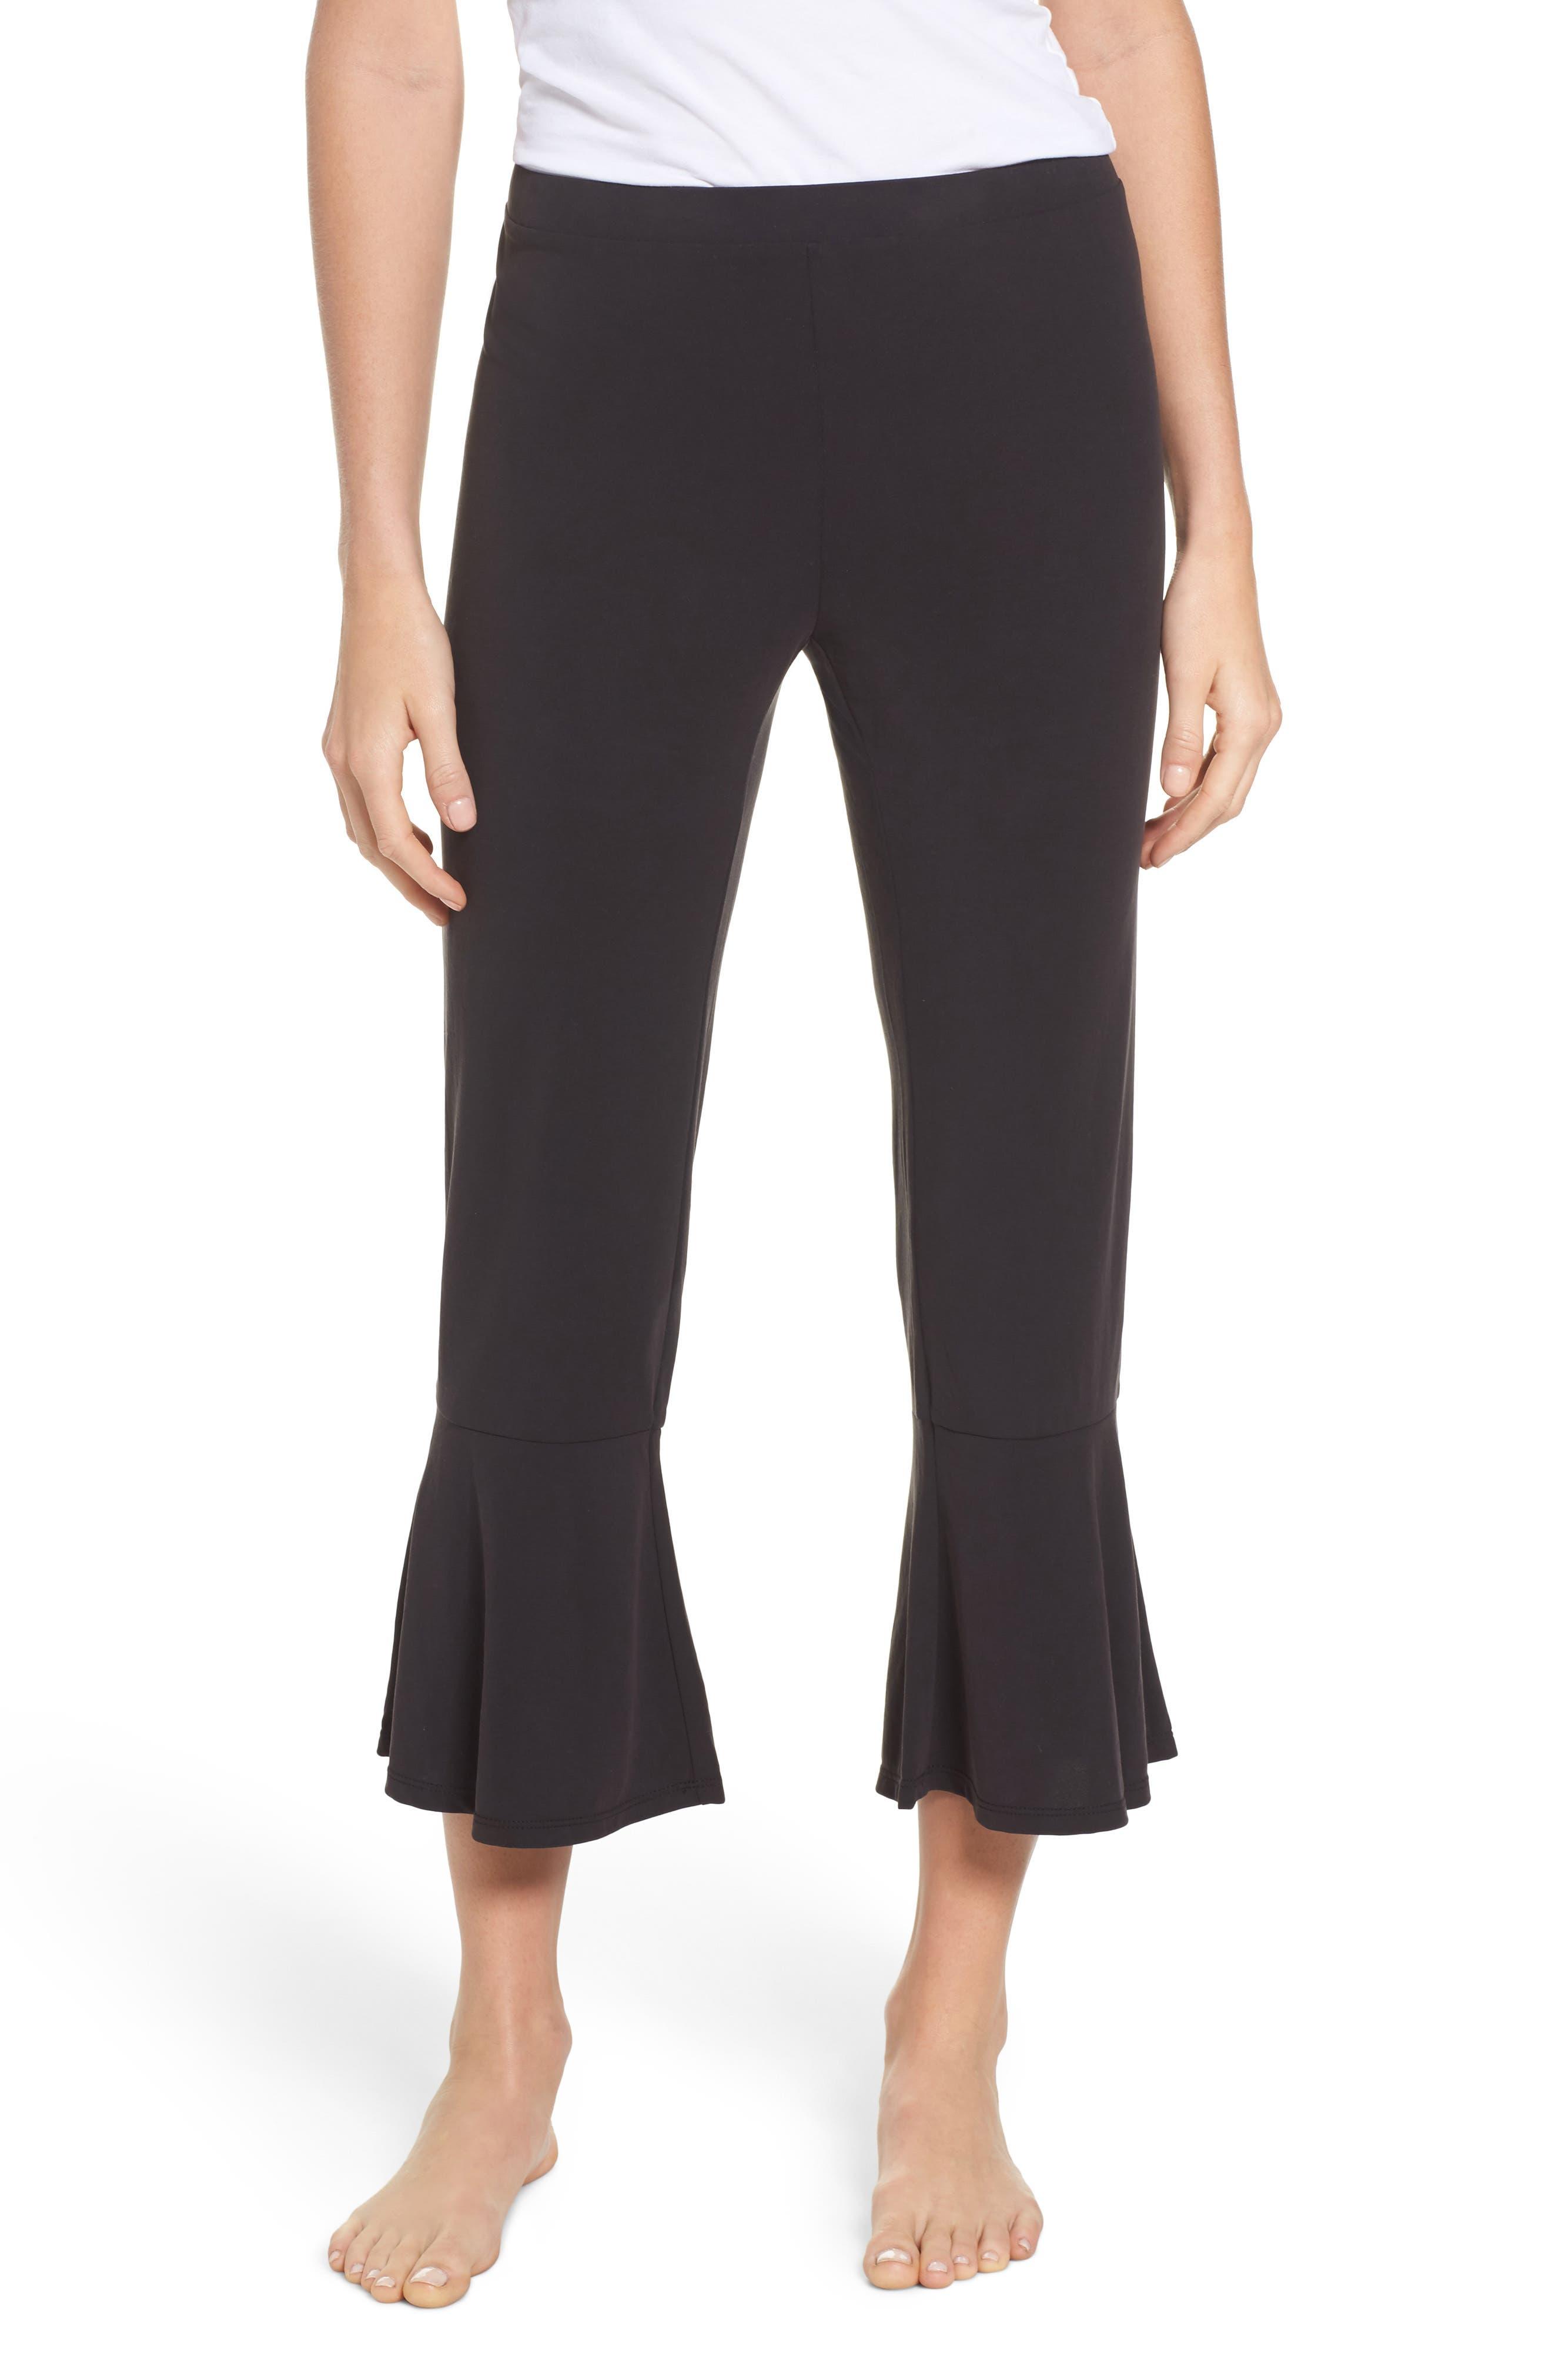 Aden Ruffle Hem Lounge Pants,                             Main thumbnail 1, color,                             BLACK